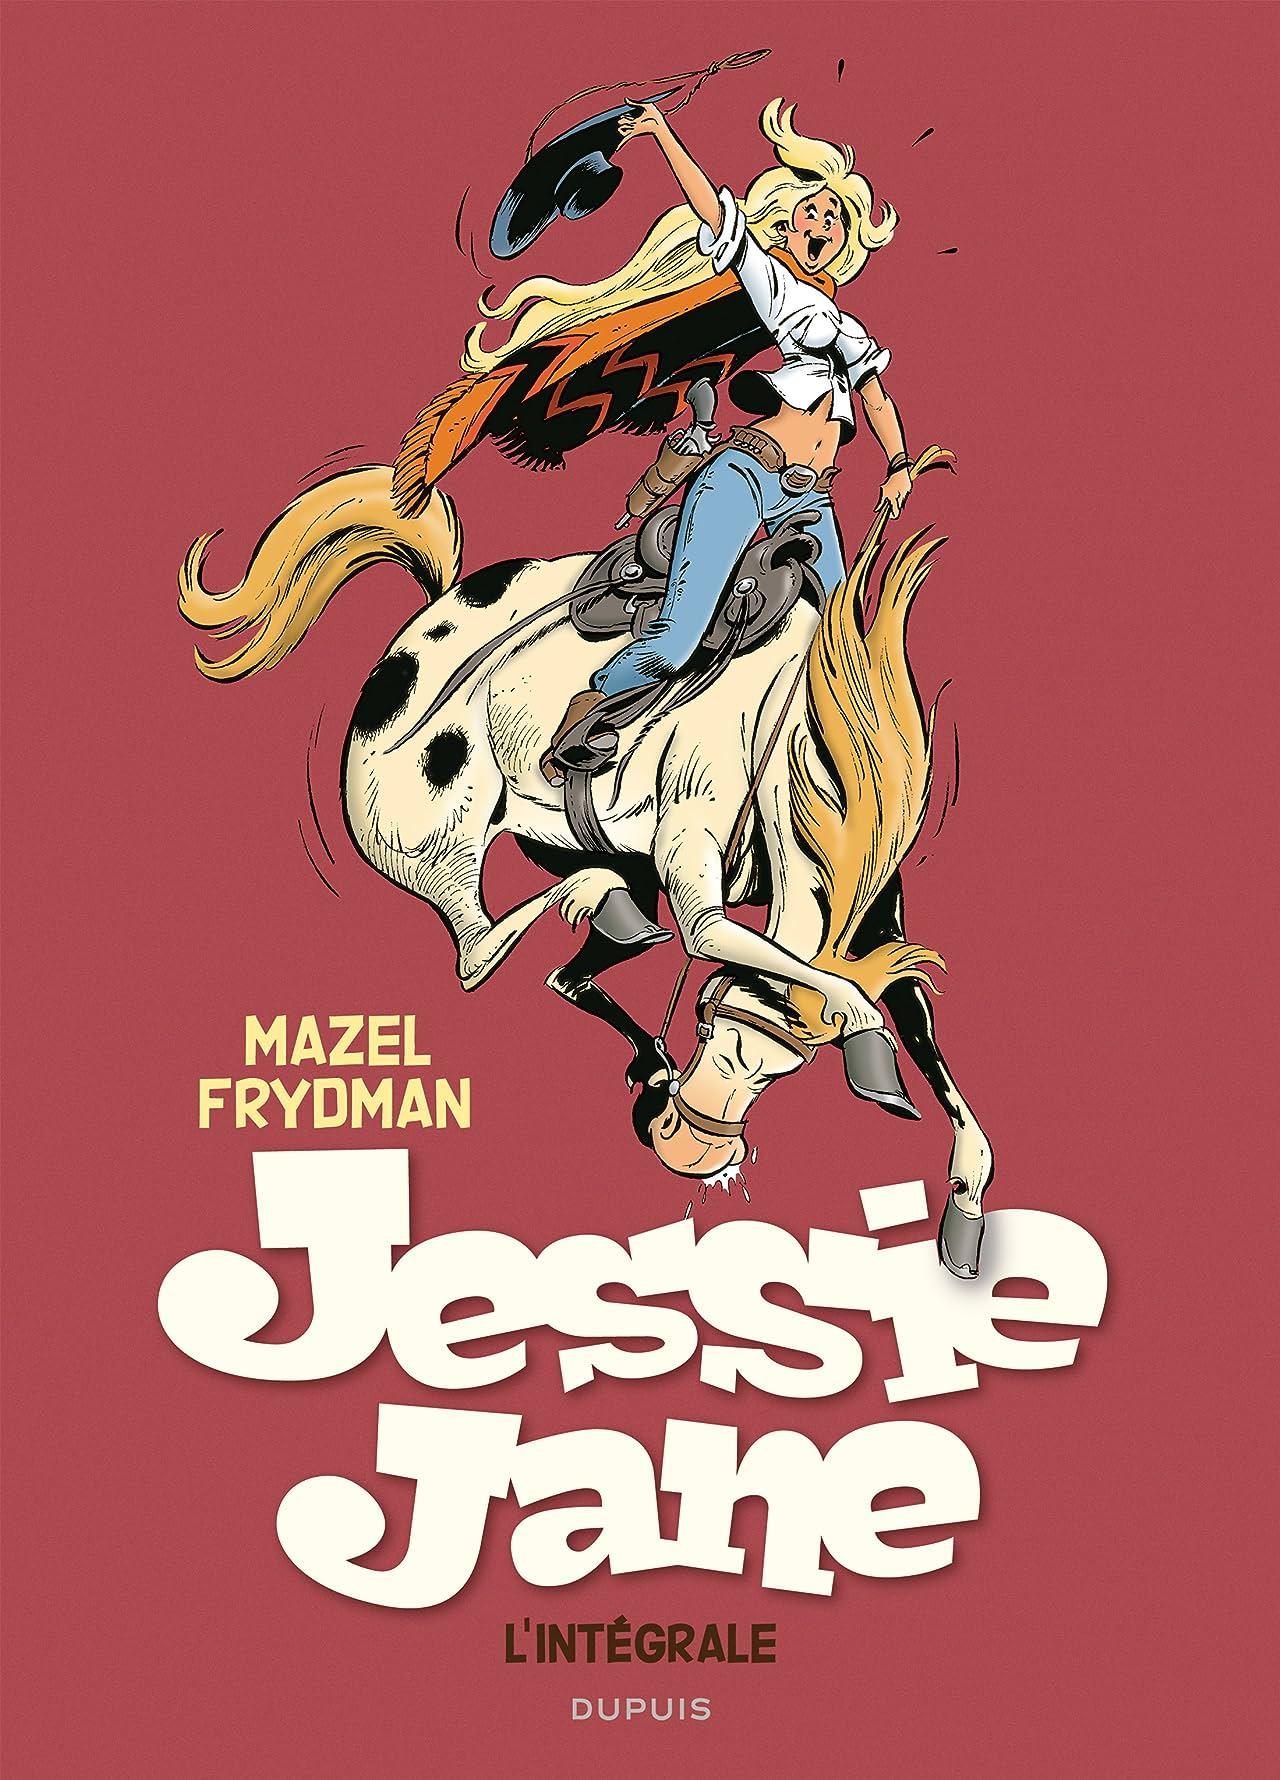 Jessie Jane l'intégrale